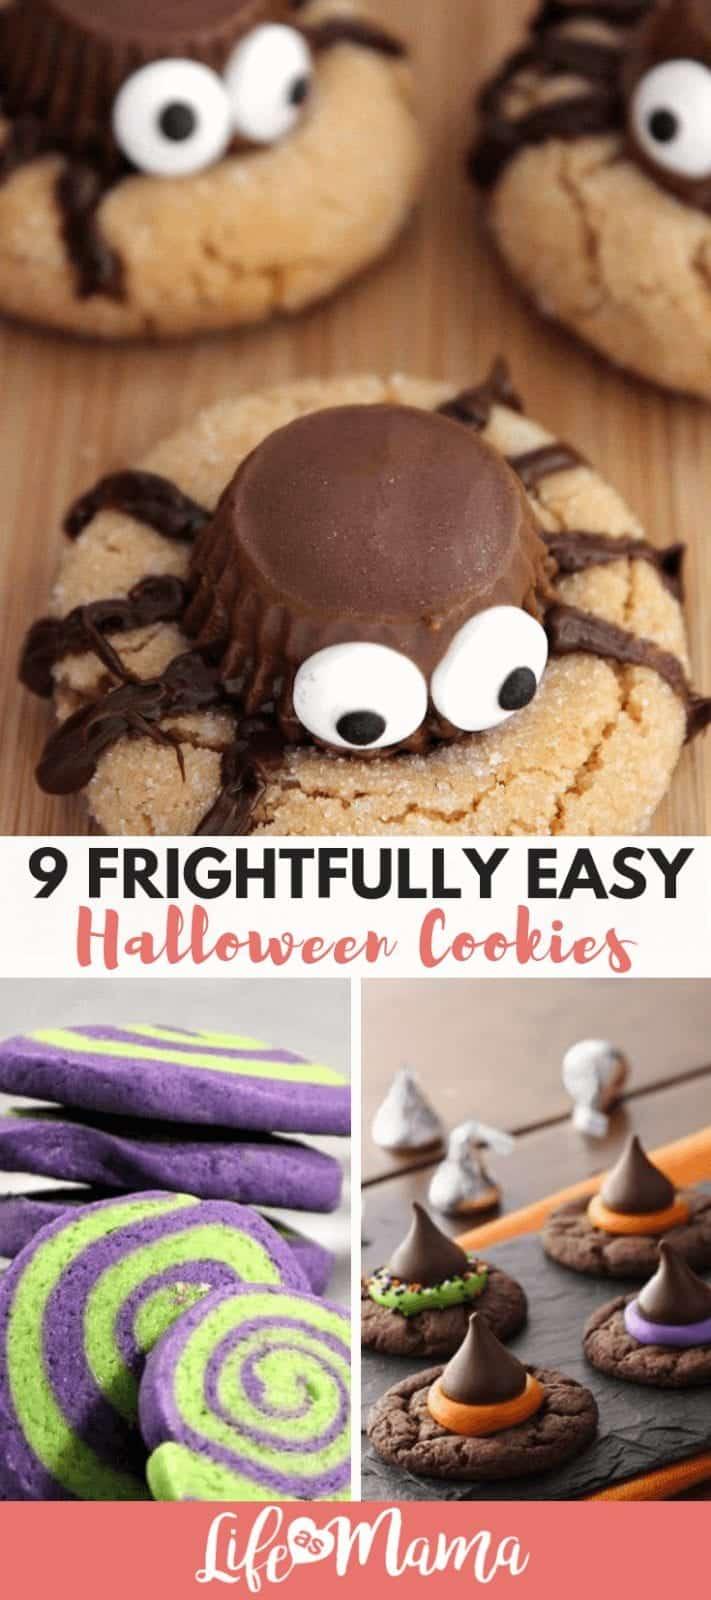 9 Frightfully Easy Halloween Cookies